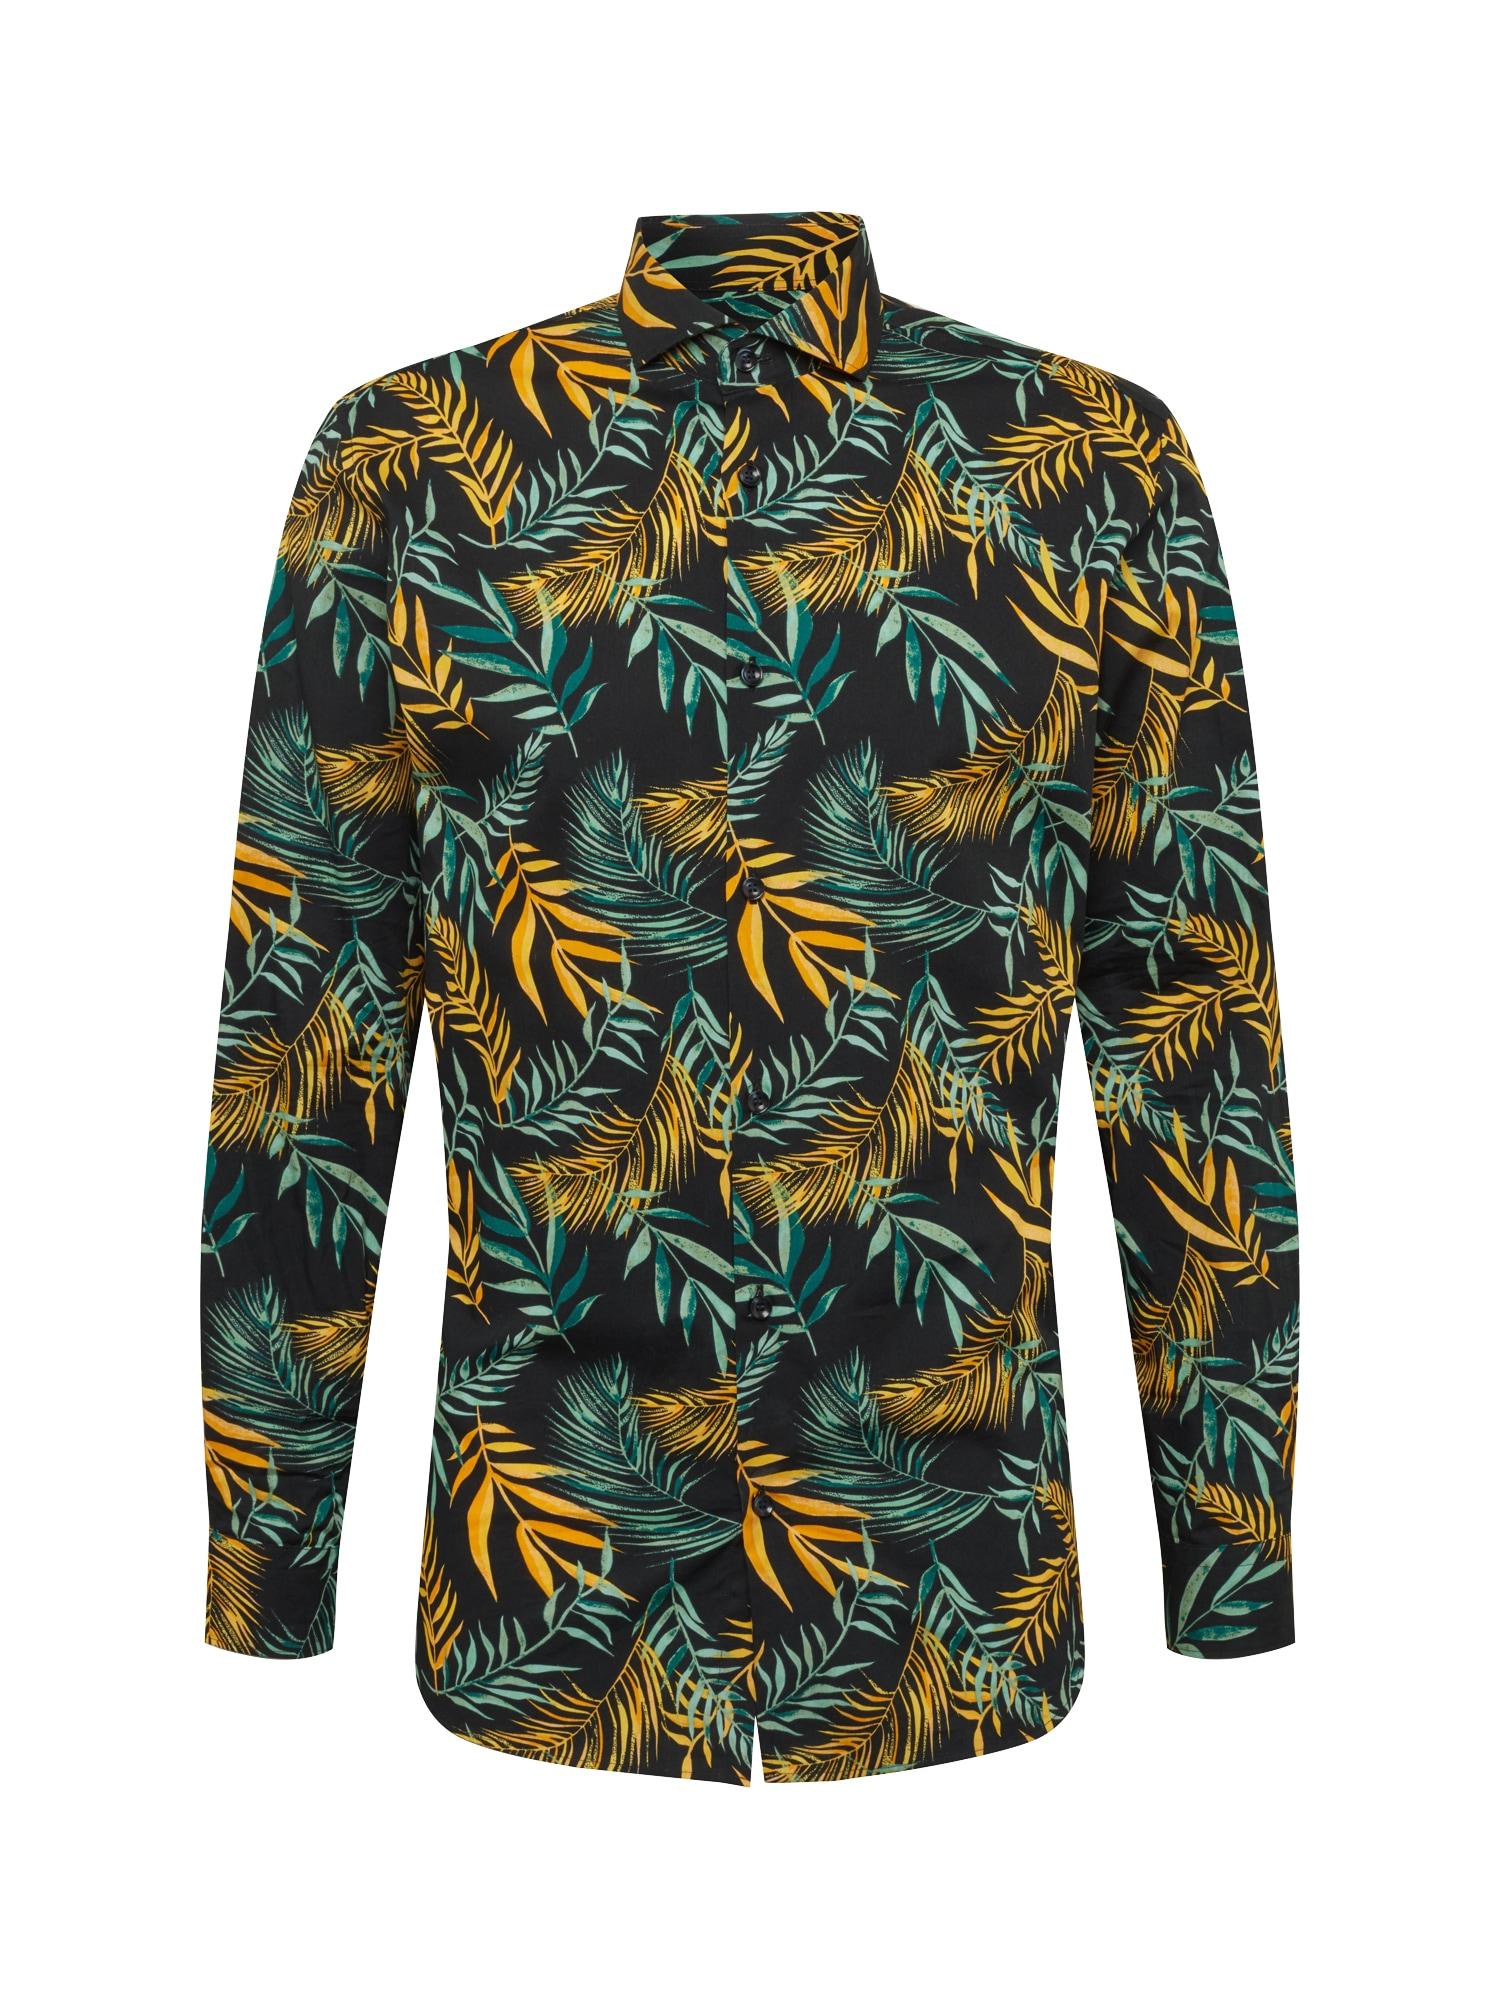 Košile SLHSLIMSEL-WINSTON SHIRT LS AOP B modrá tmavě modrá zlatá SELECTED HOMME